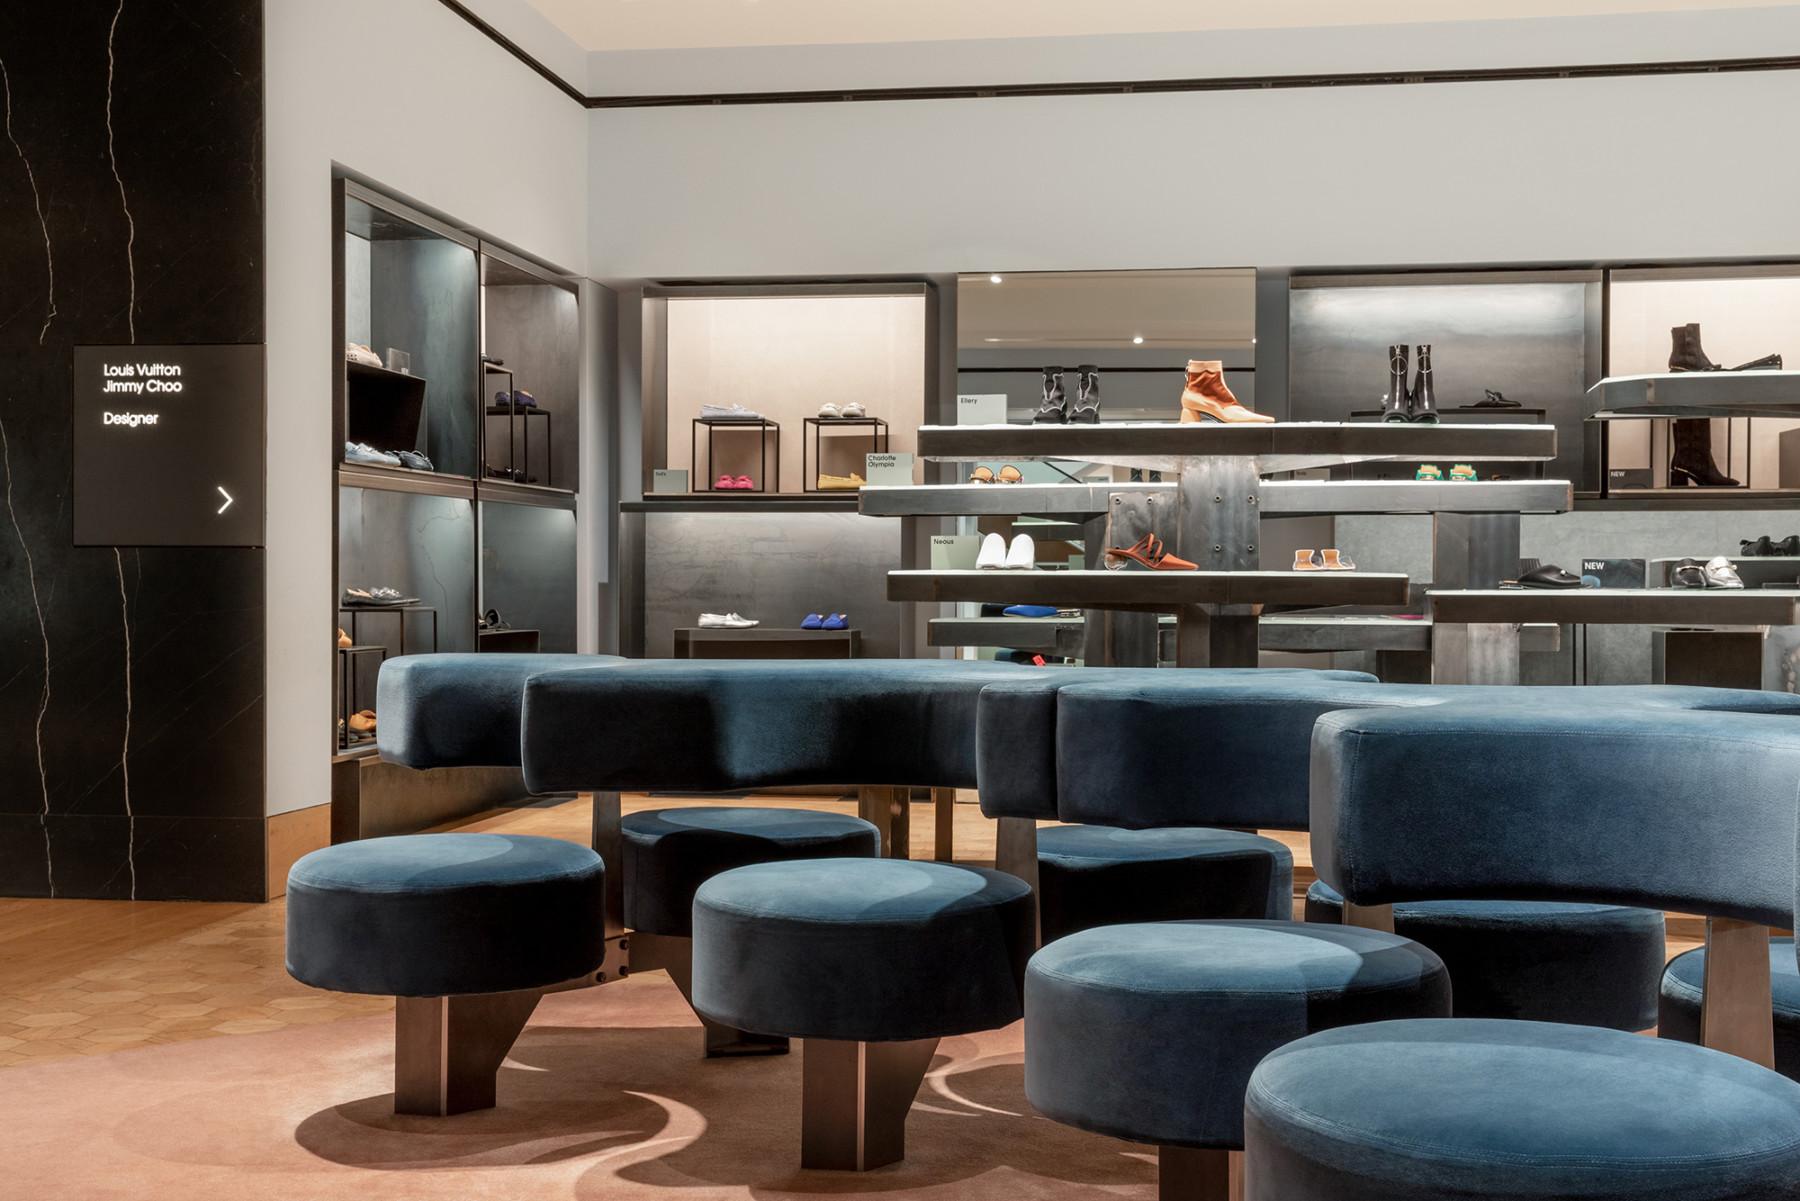 jamie-fobert-architects-selfridges-shoe-galleries-luxury-retail-concept-gallery-design-olivier-hess-photos-(7)